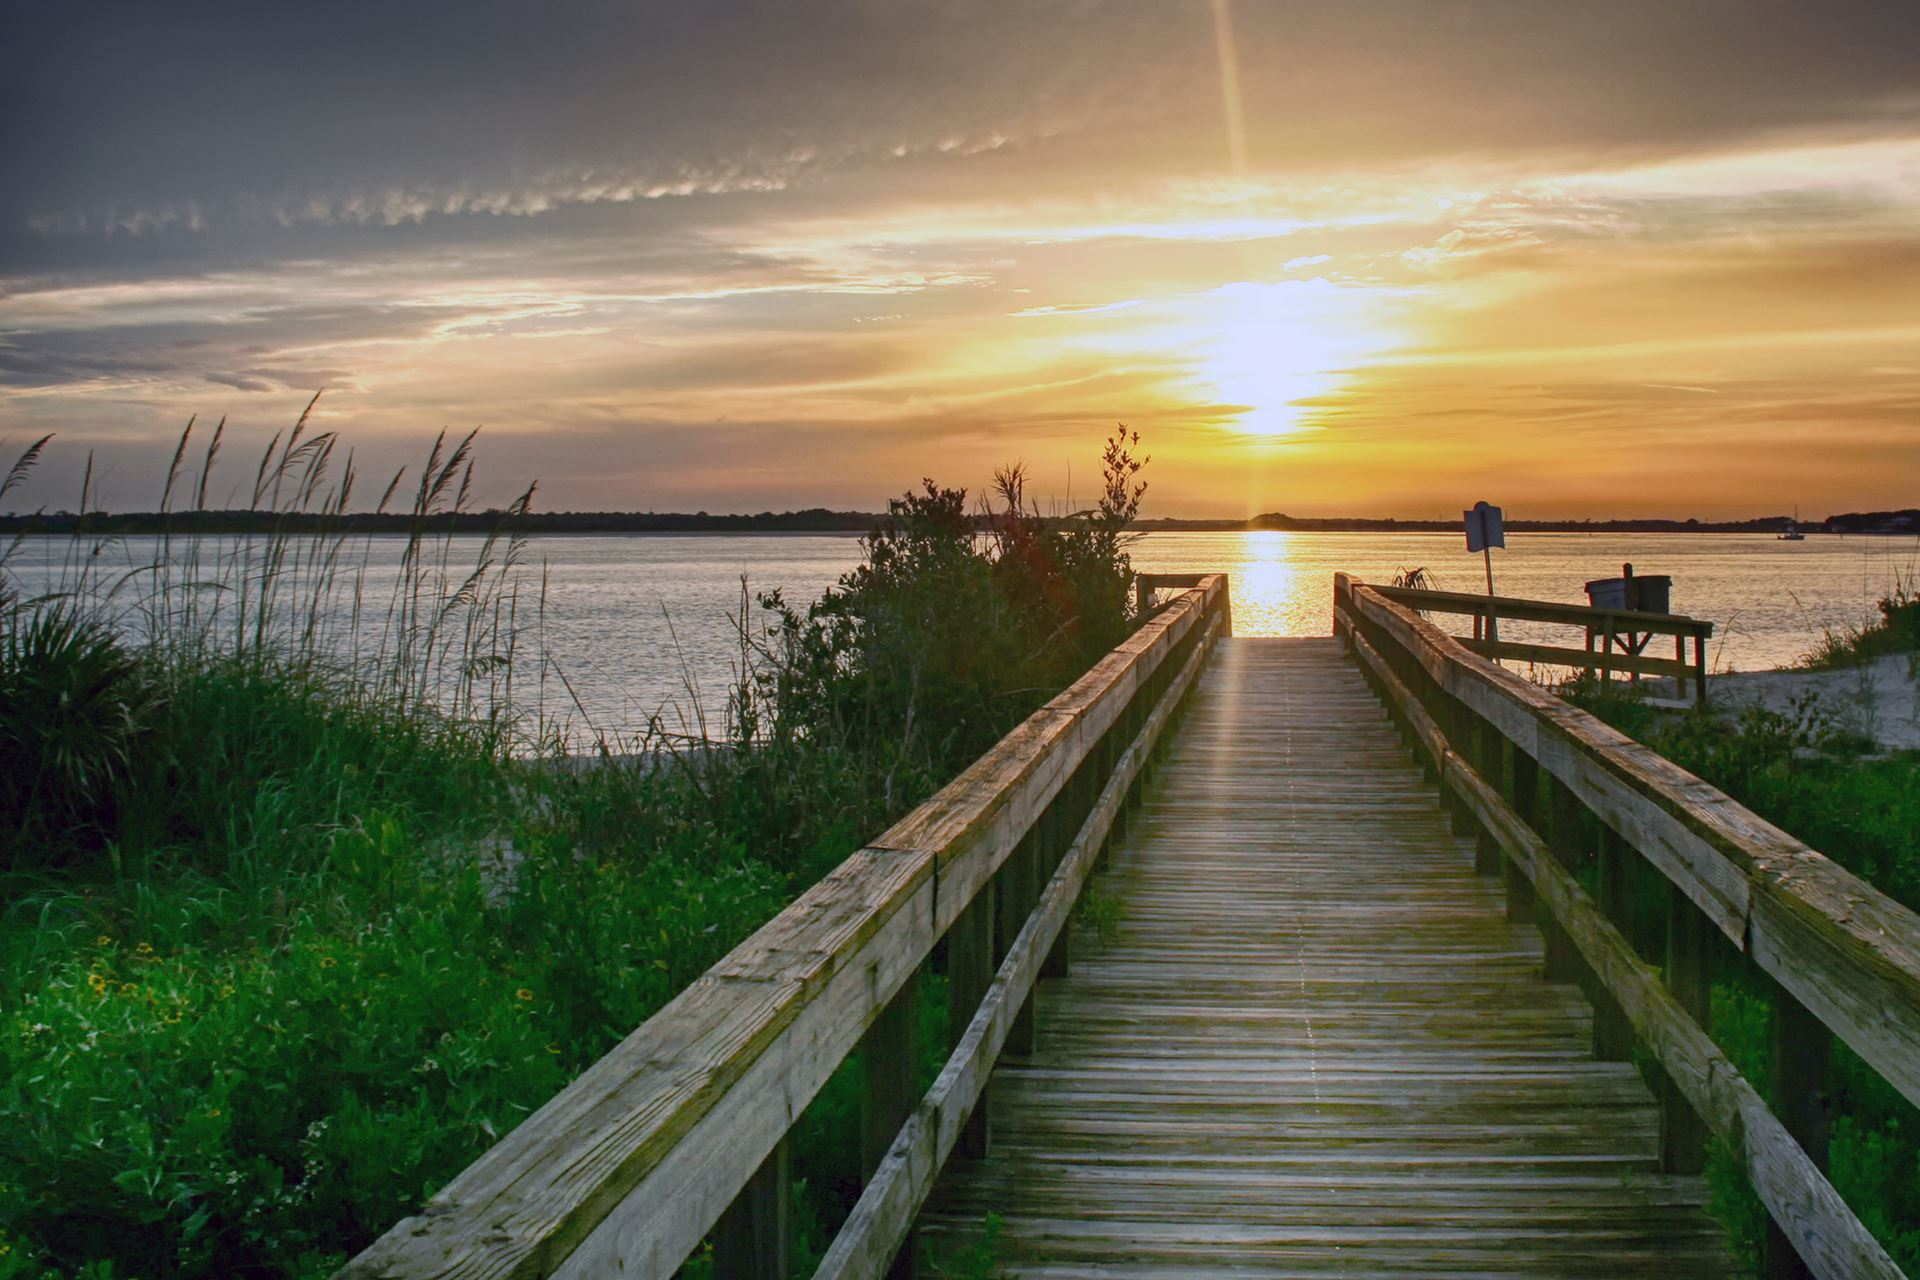 Southeastern Bonanza Society - New Smyrna Beach, Florida (KEVB)